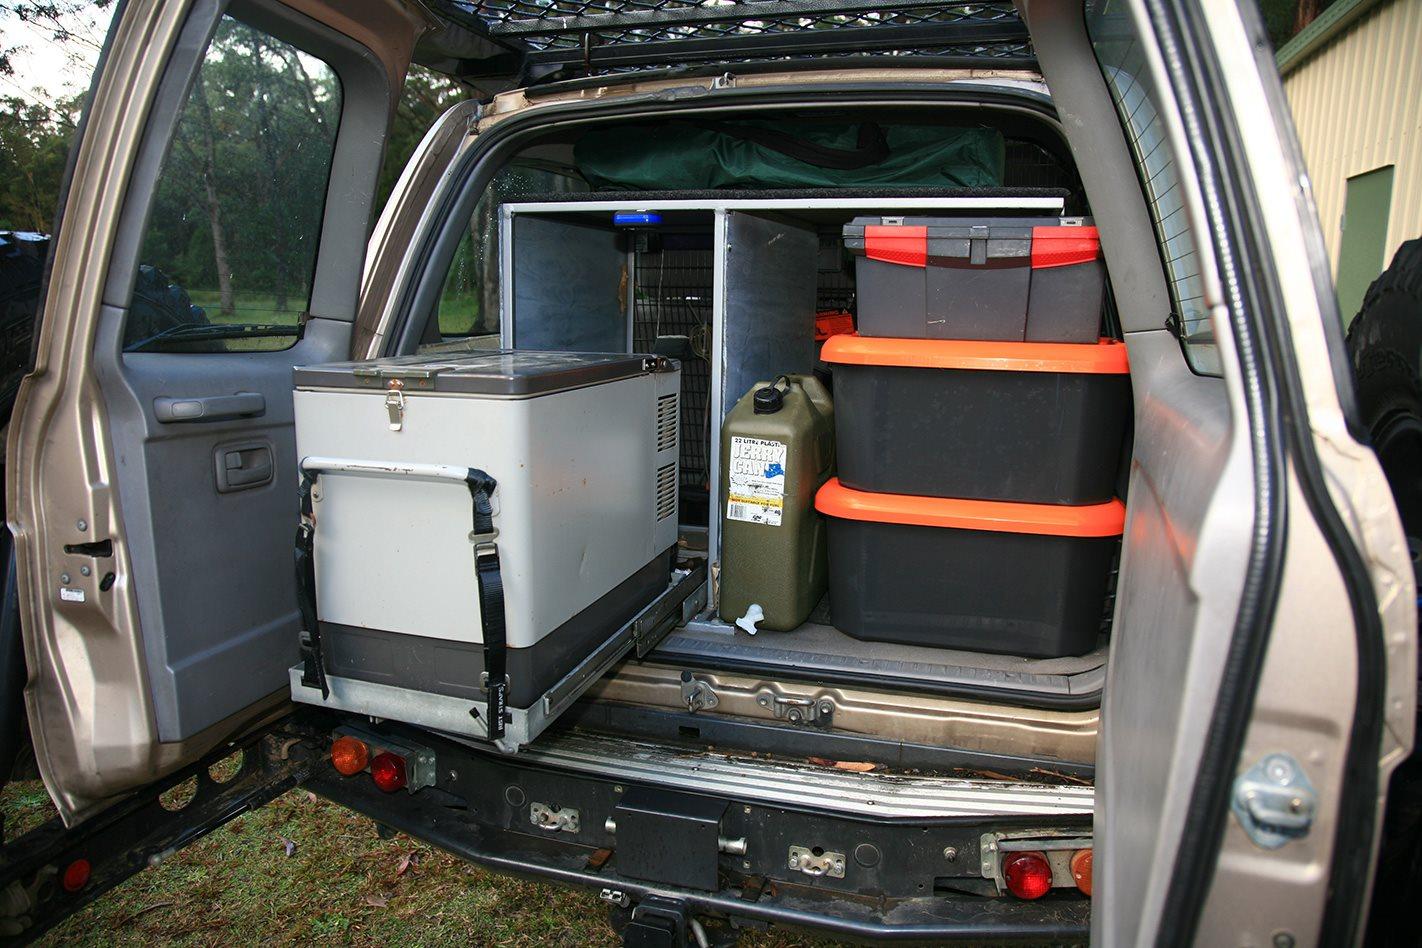 Toyota Land Cruiser 100 Series custom storage